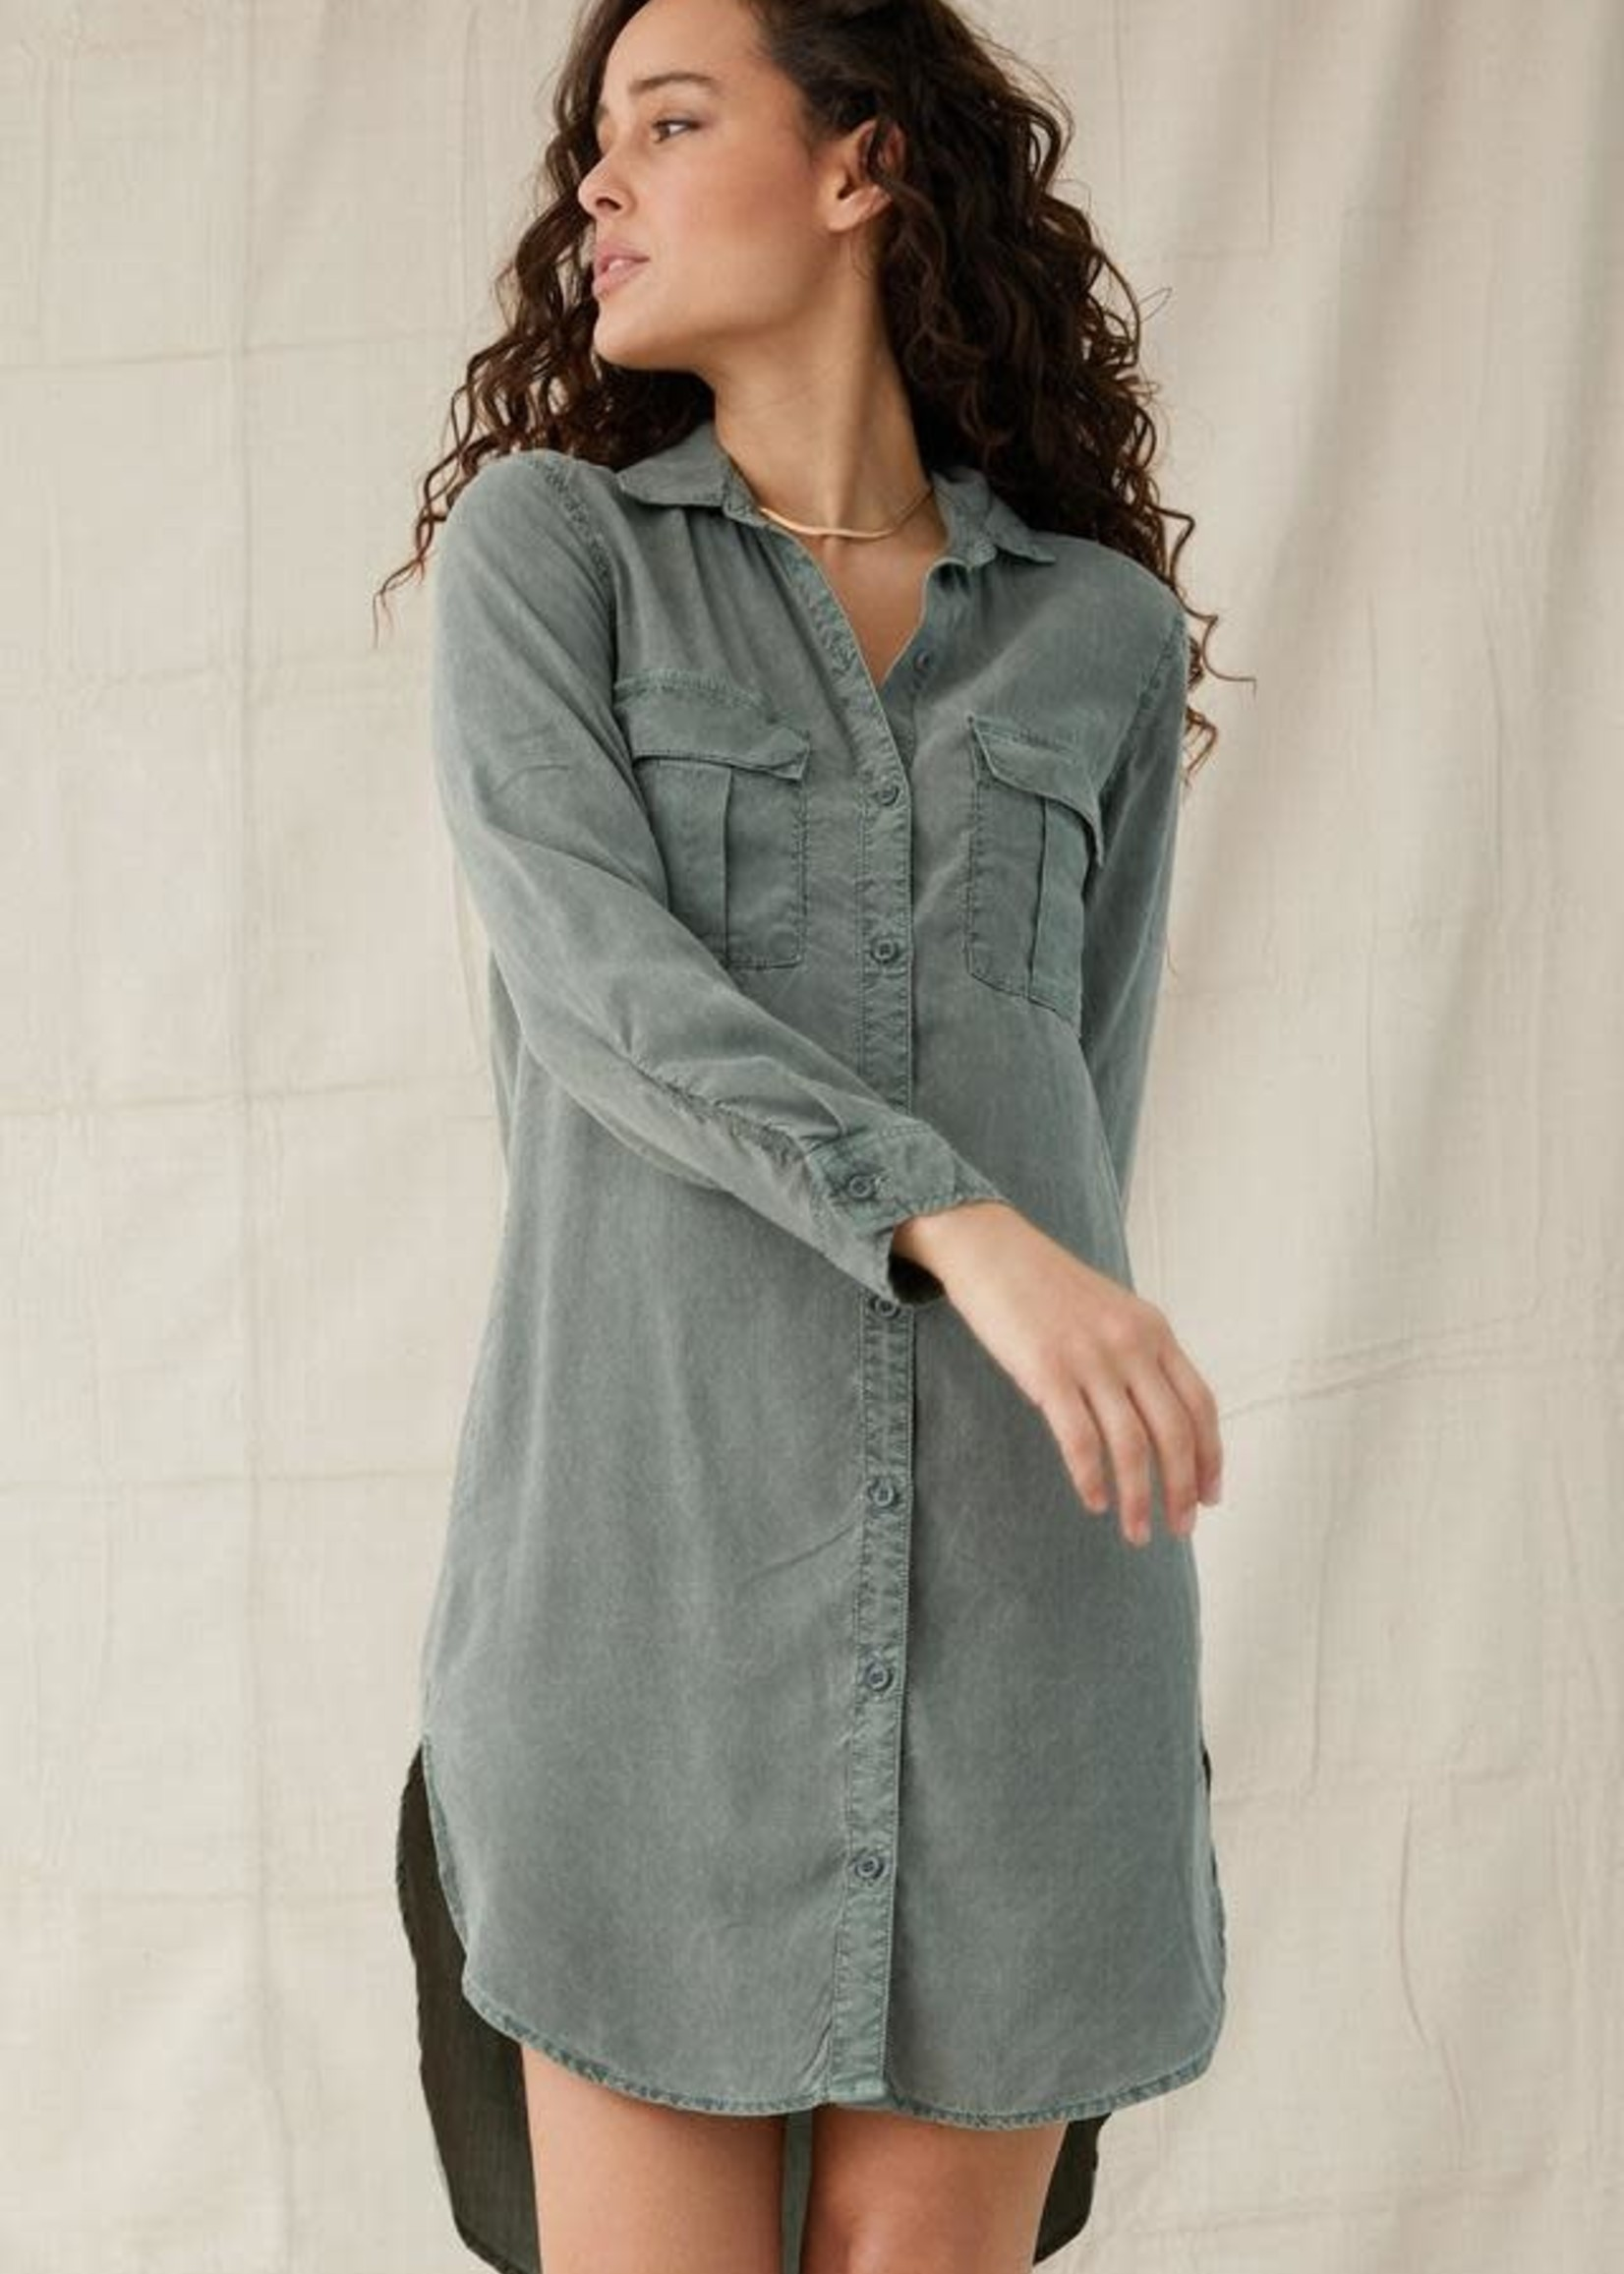 Bella Dahl Two Pocket Shirt Dress